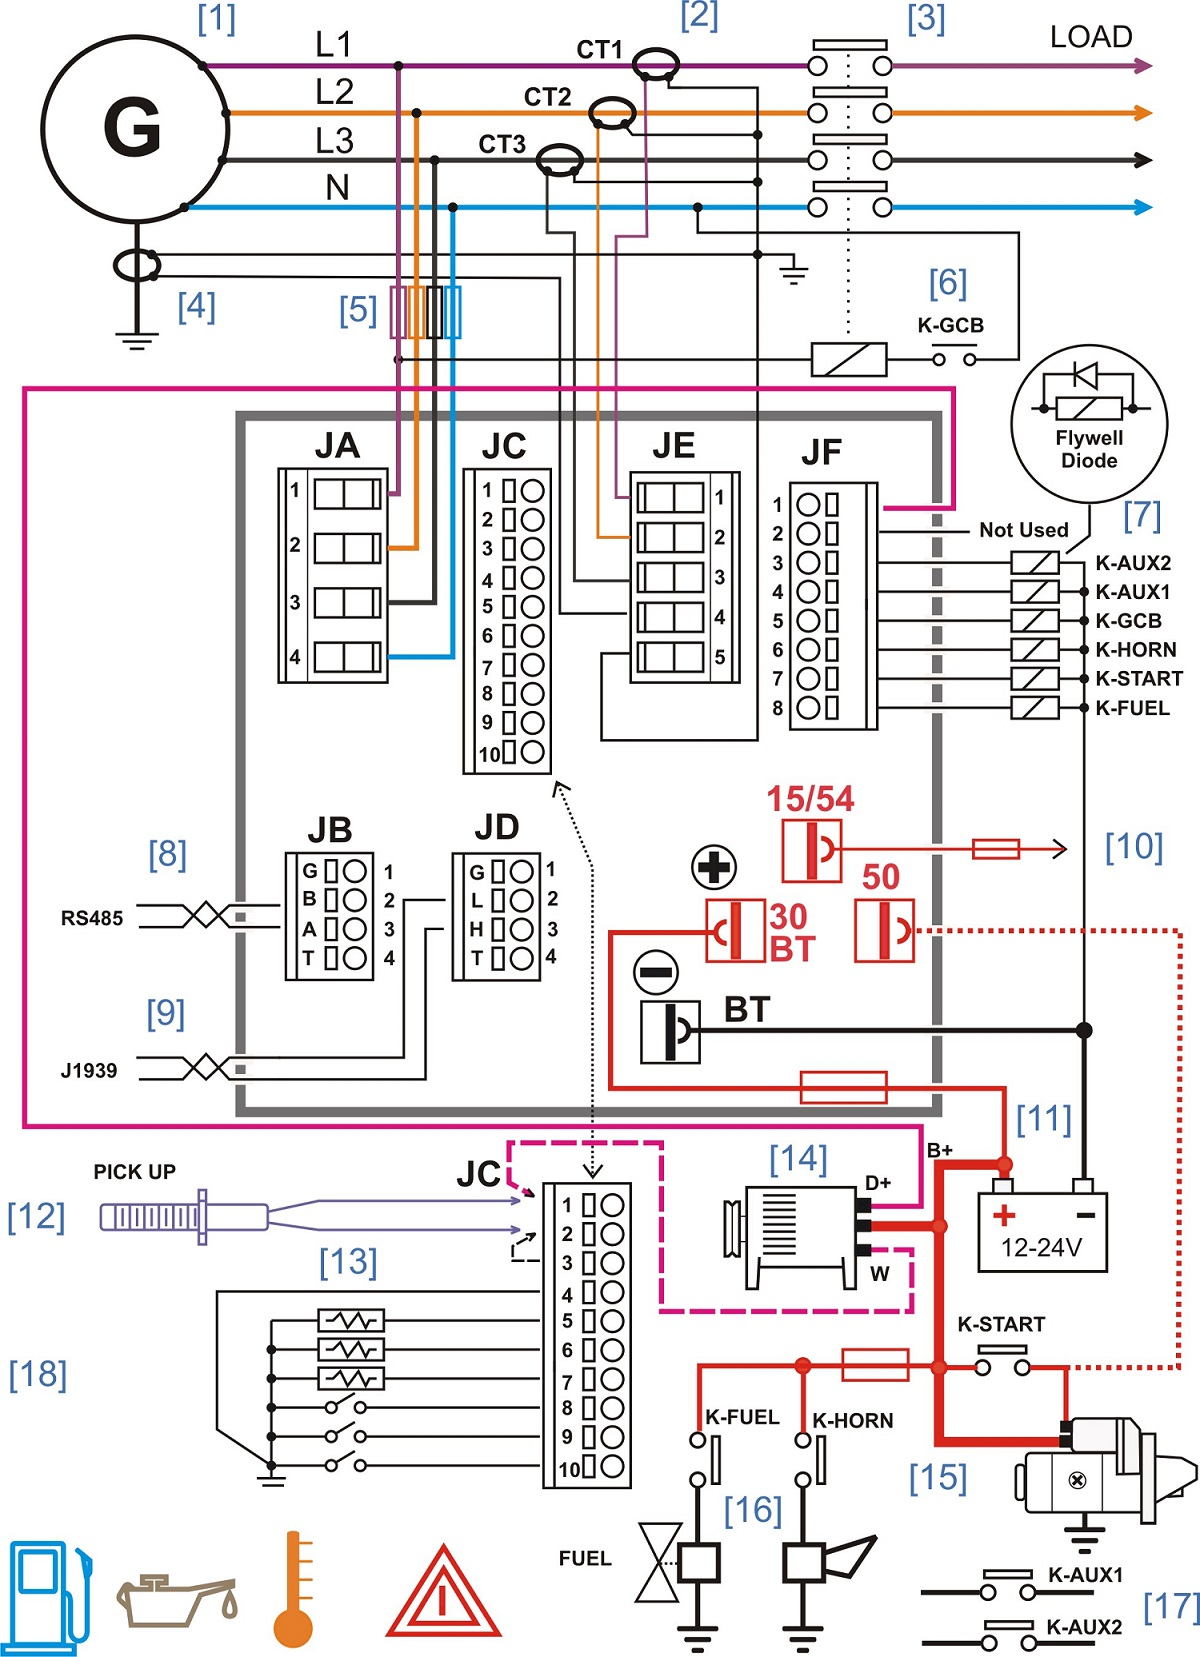 generator auto start circuit diagram – generator controllers remote start wiring diagrams for generators  bernini design srl